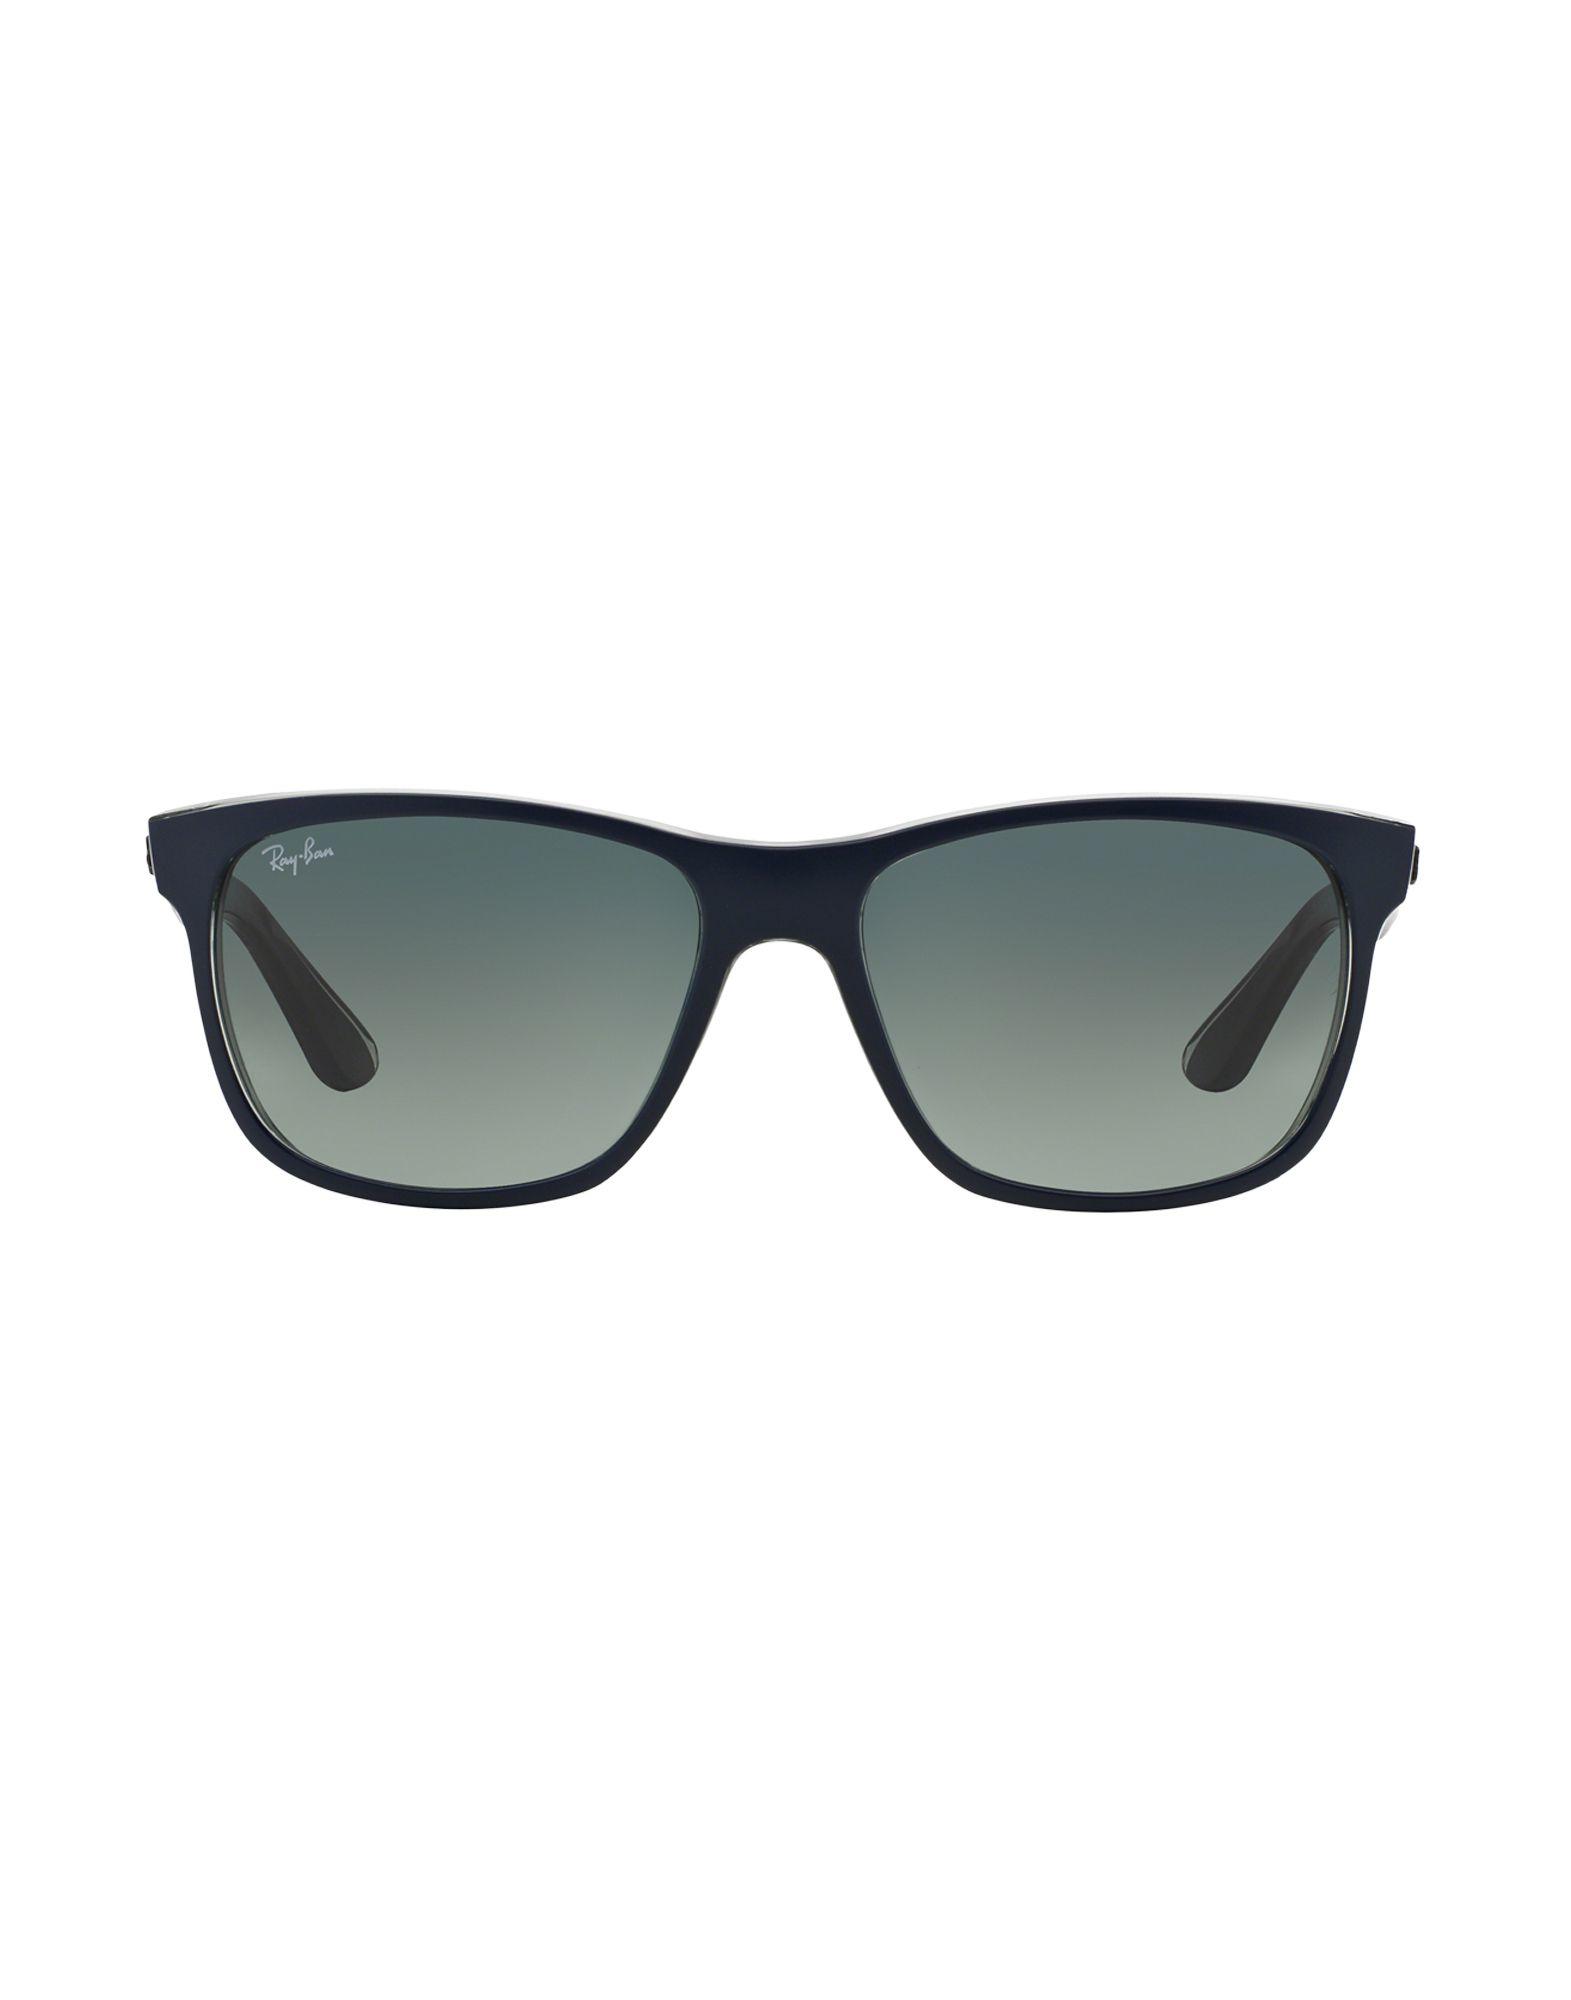 Mens Blue Ray Ban Sunglasses « Heritage Malta